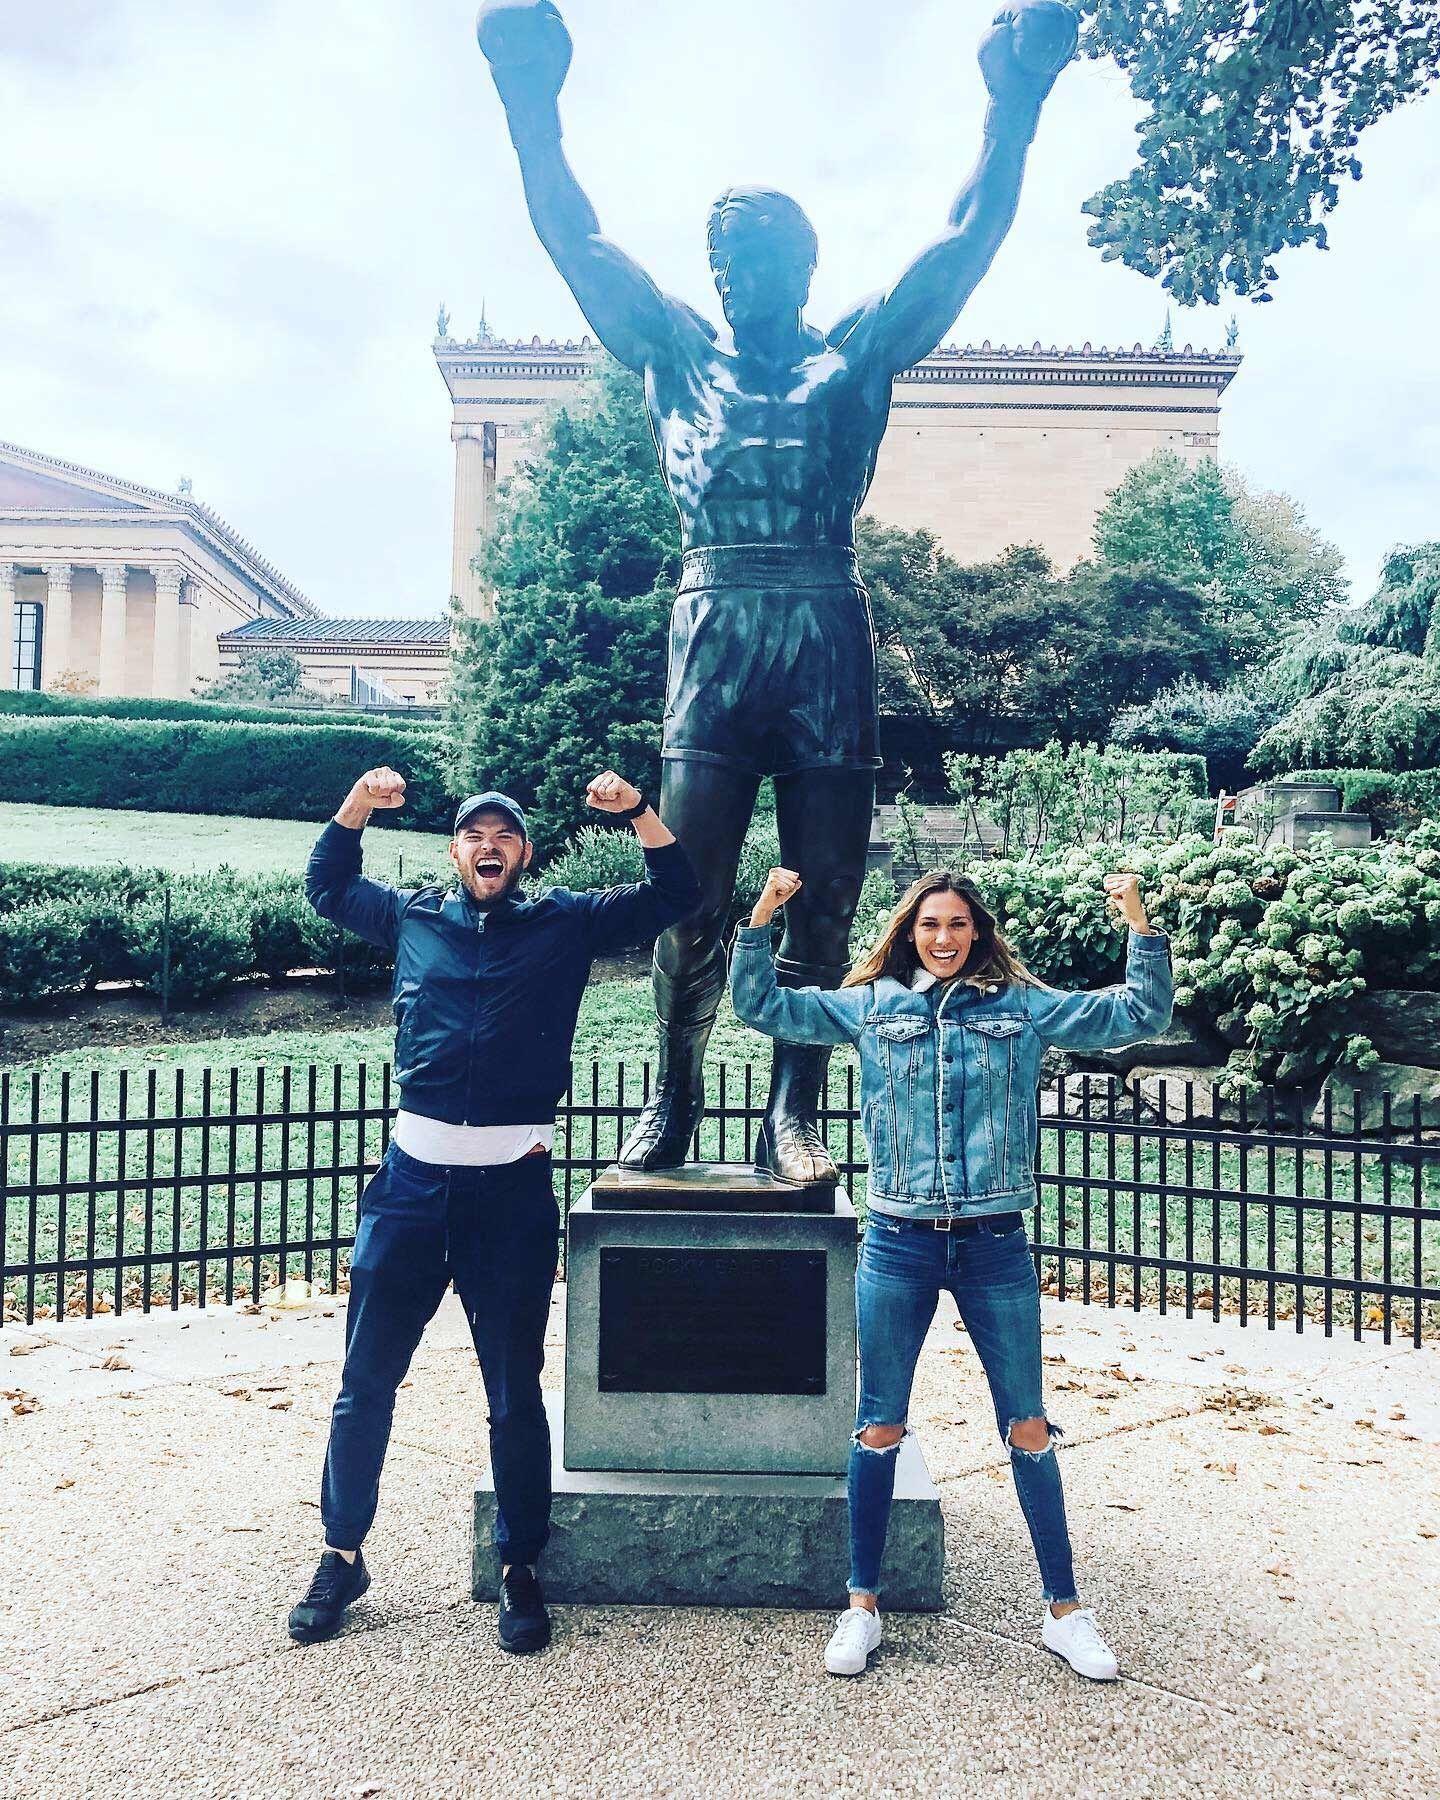 Kellan Lutz and wife in Philadelphia in front of Rocky statue.